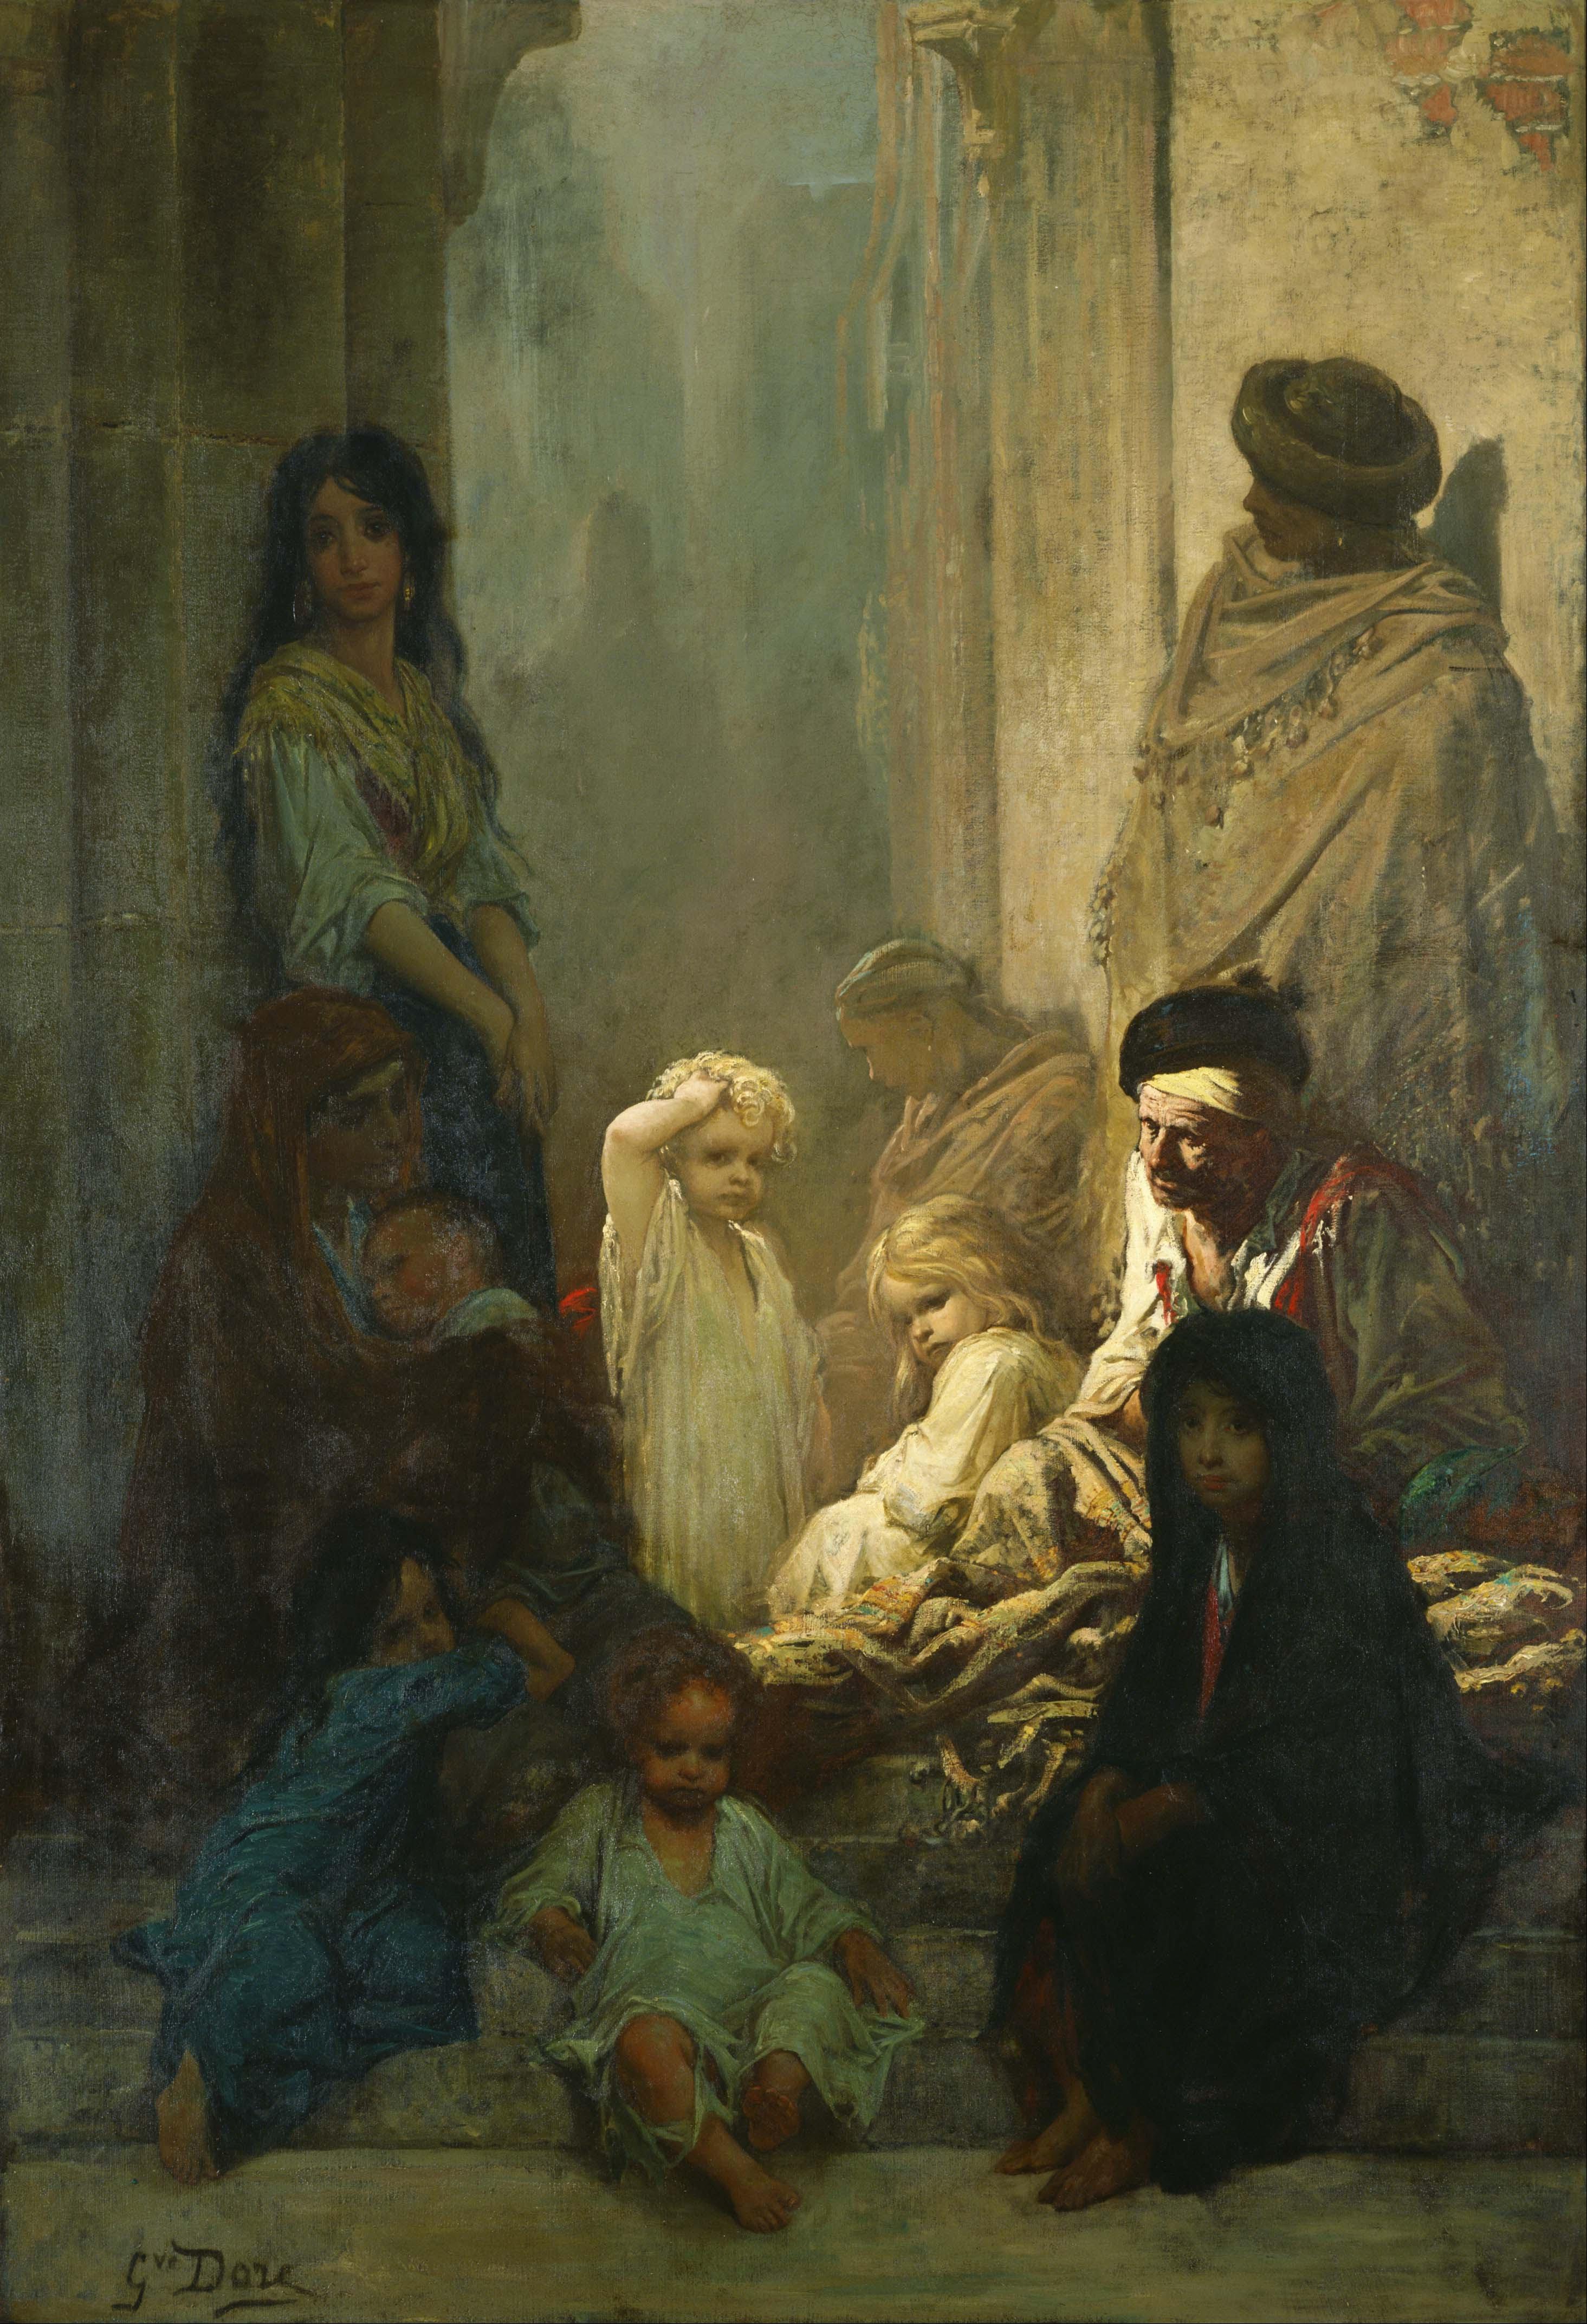 Gustave_Dore_-_La_Siesta,_Memory_of_Spain